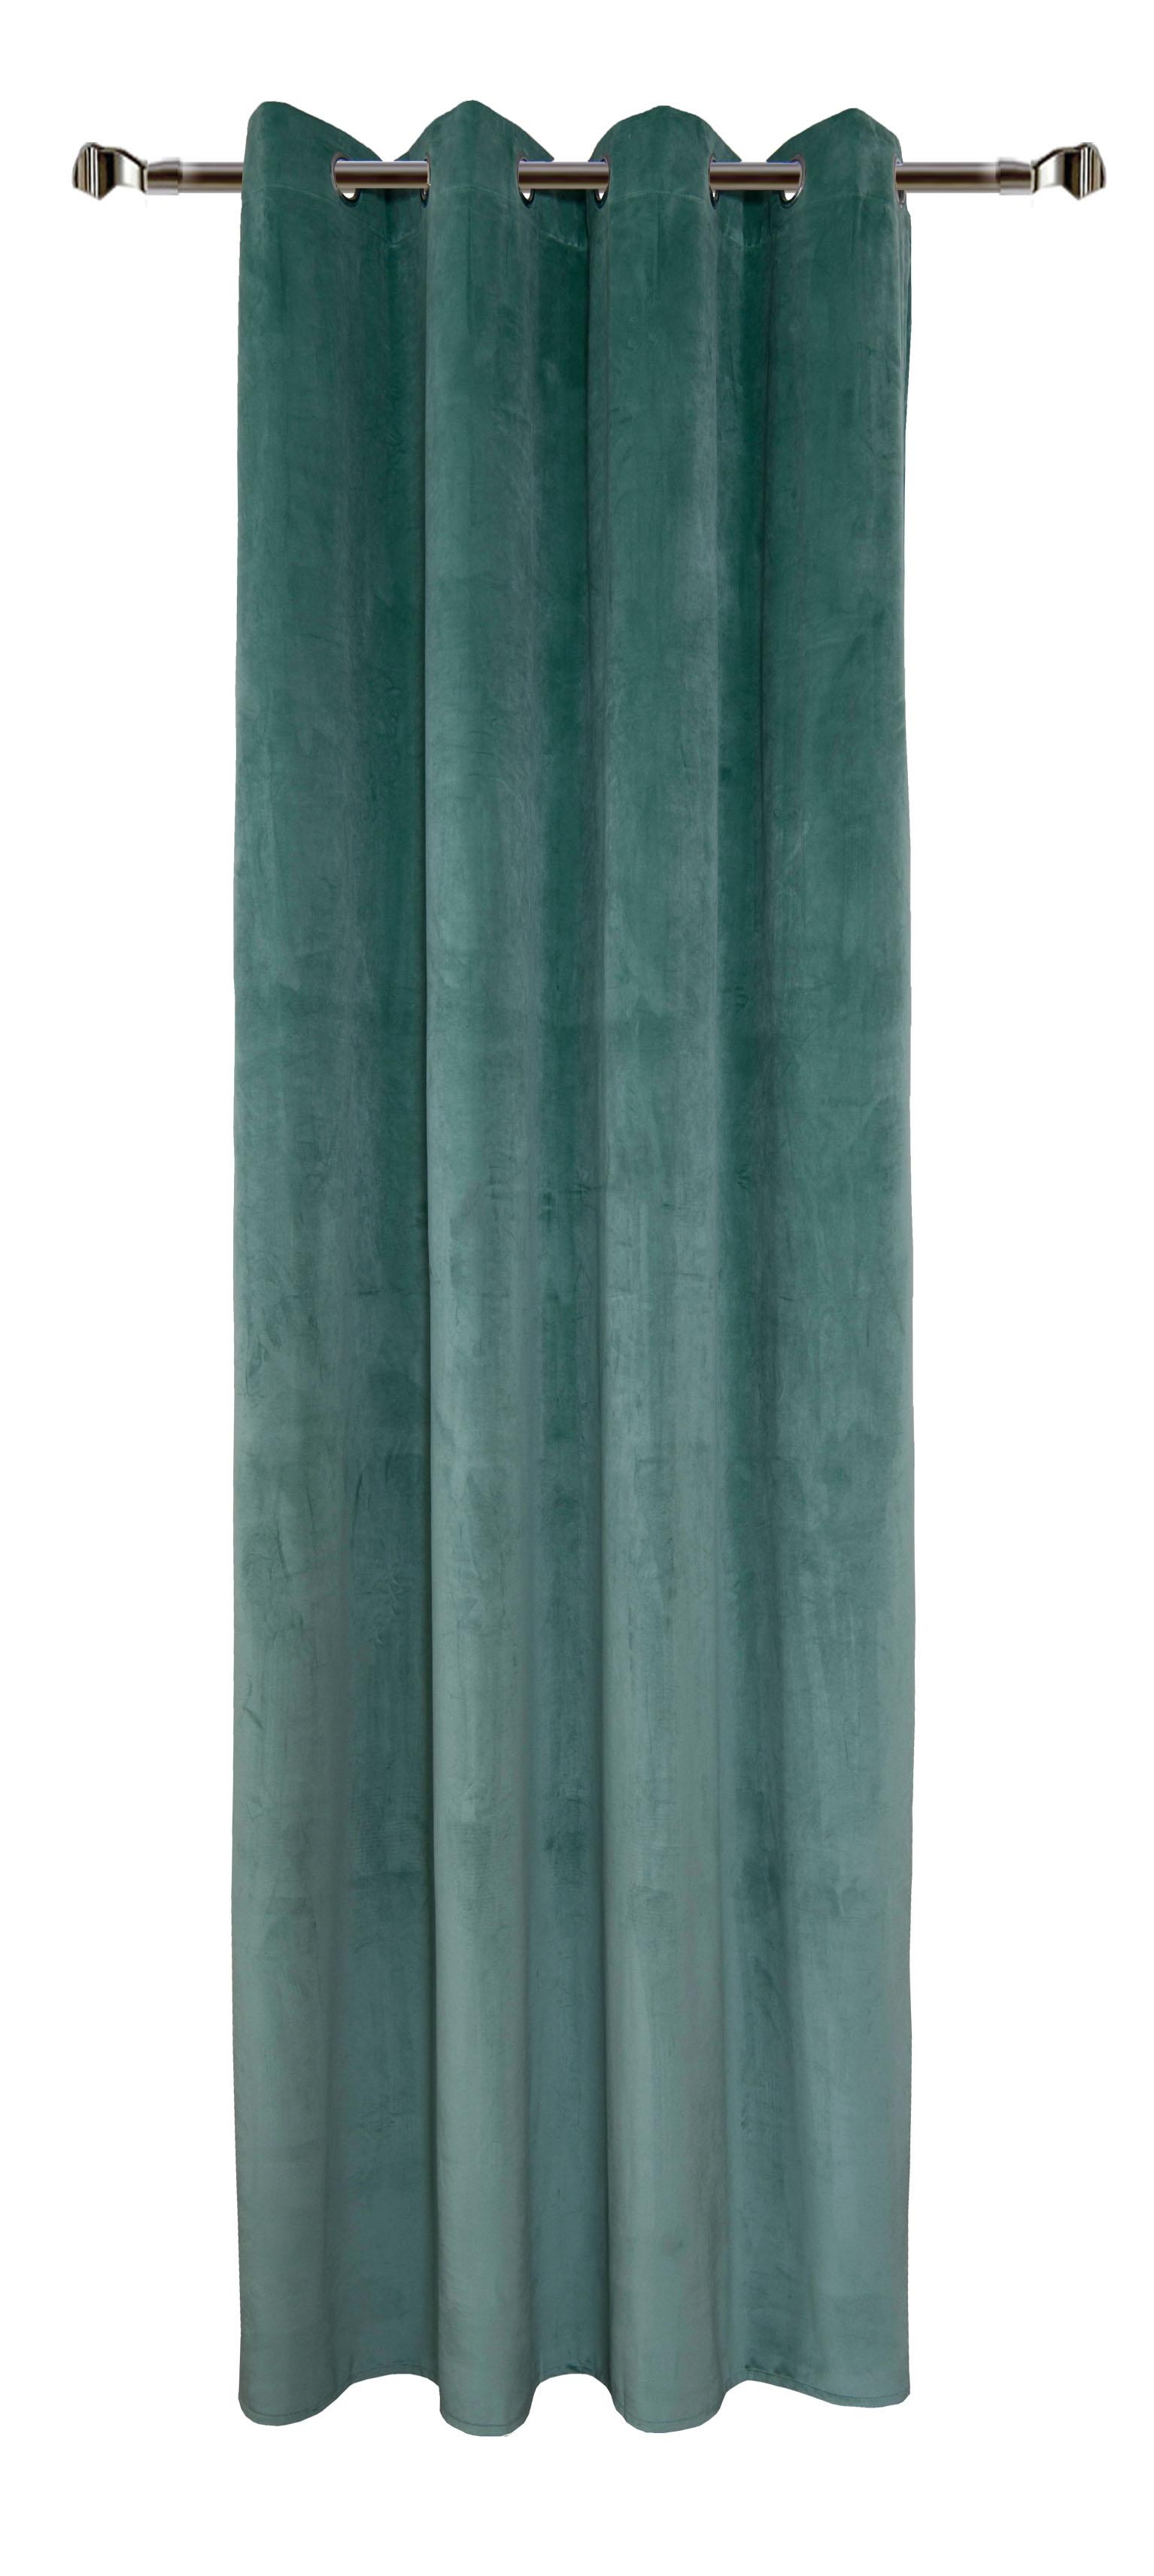 Draperie Home RM-MJ11-65, Petrol Green 140 x 270 cm, 1 bucata